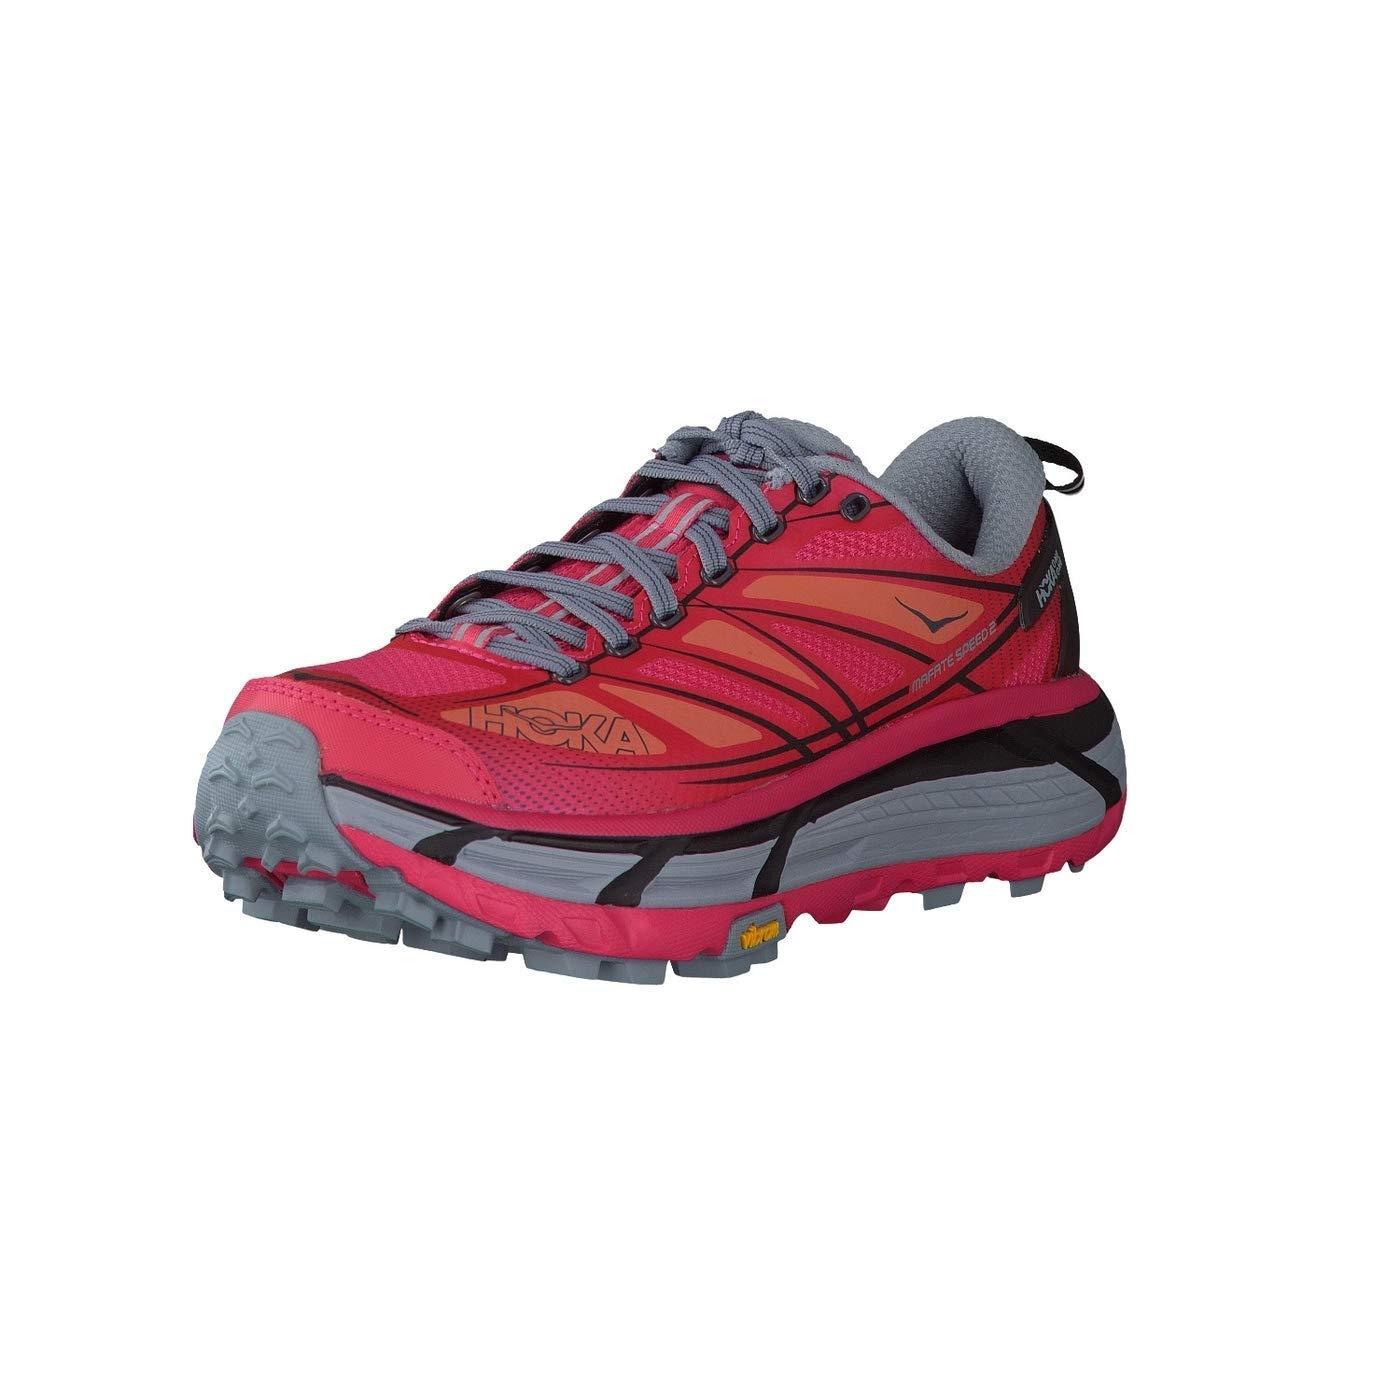 Hoka Mafate Speed 2 Woman Azalea/Black - Zapatillas trail running para mujer, -, 39 1-3: MainApps: Amazon.es: Deportes y aire libre